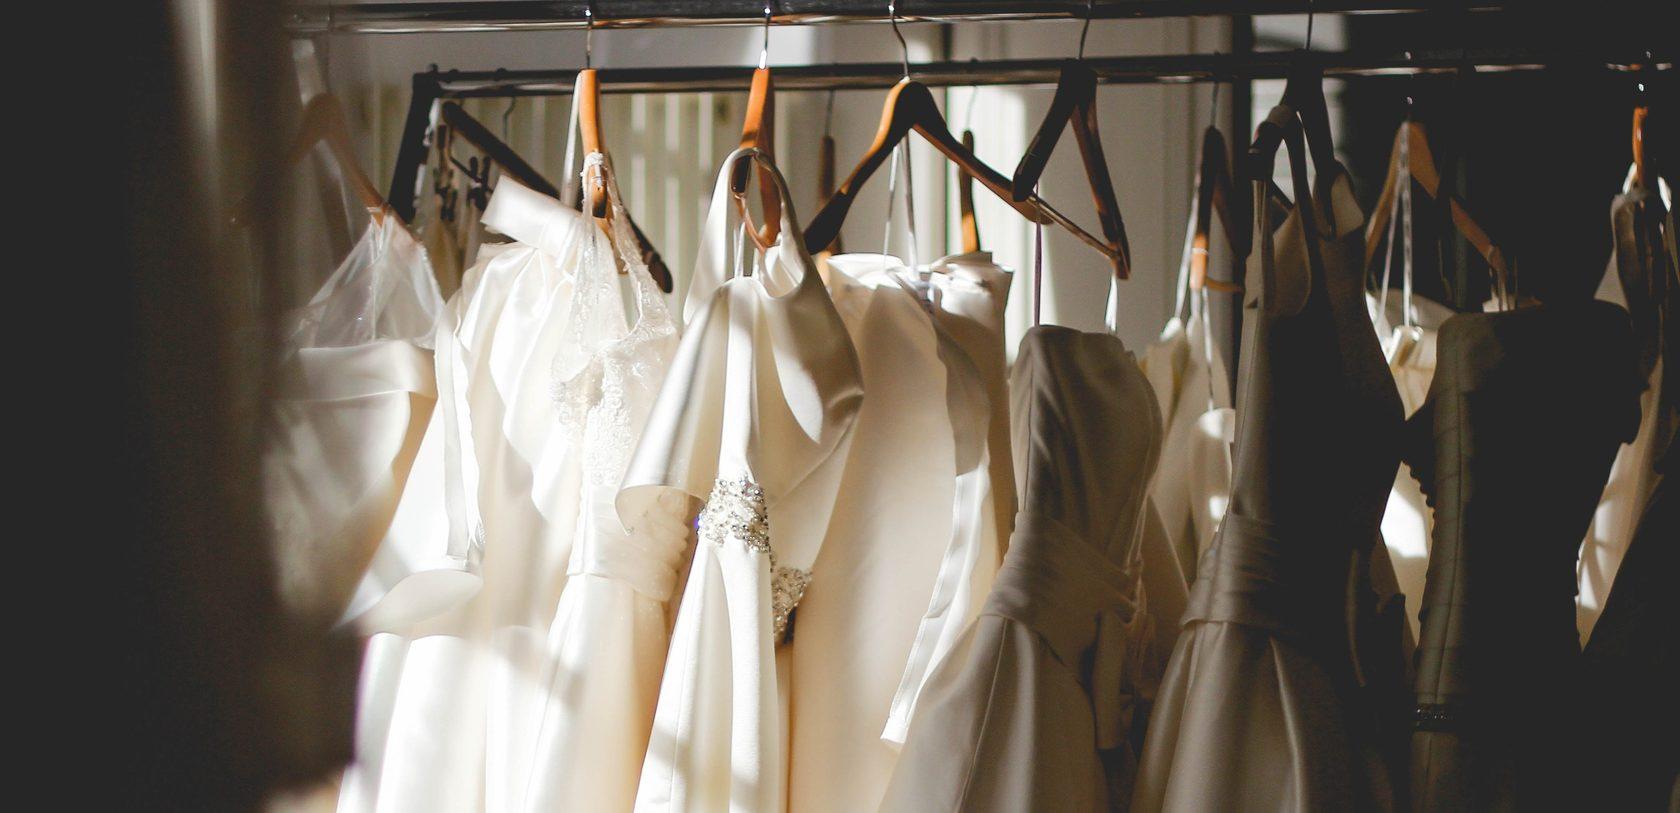 Top 50 Israeli Wedding Dress Designers Find You Dress Right Here,Navy Blue Wedding Dress Plus Size